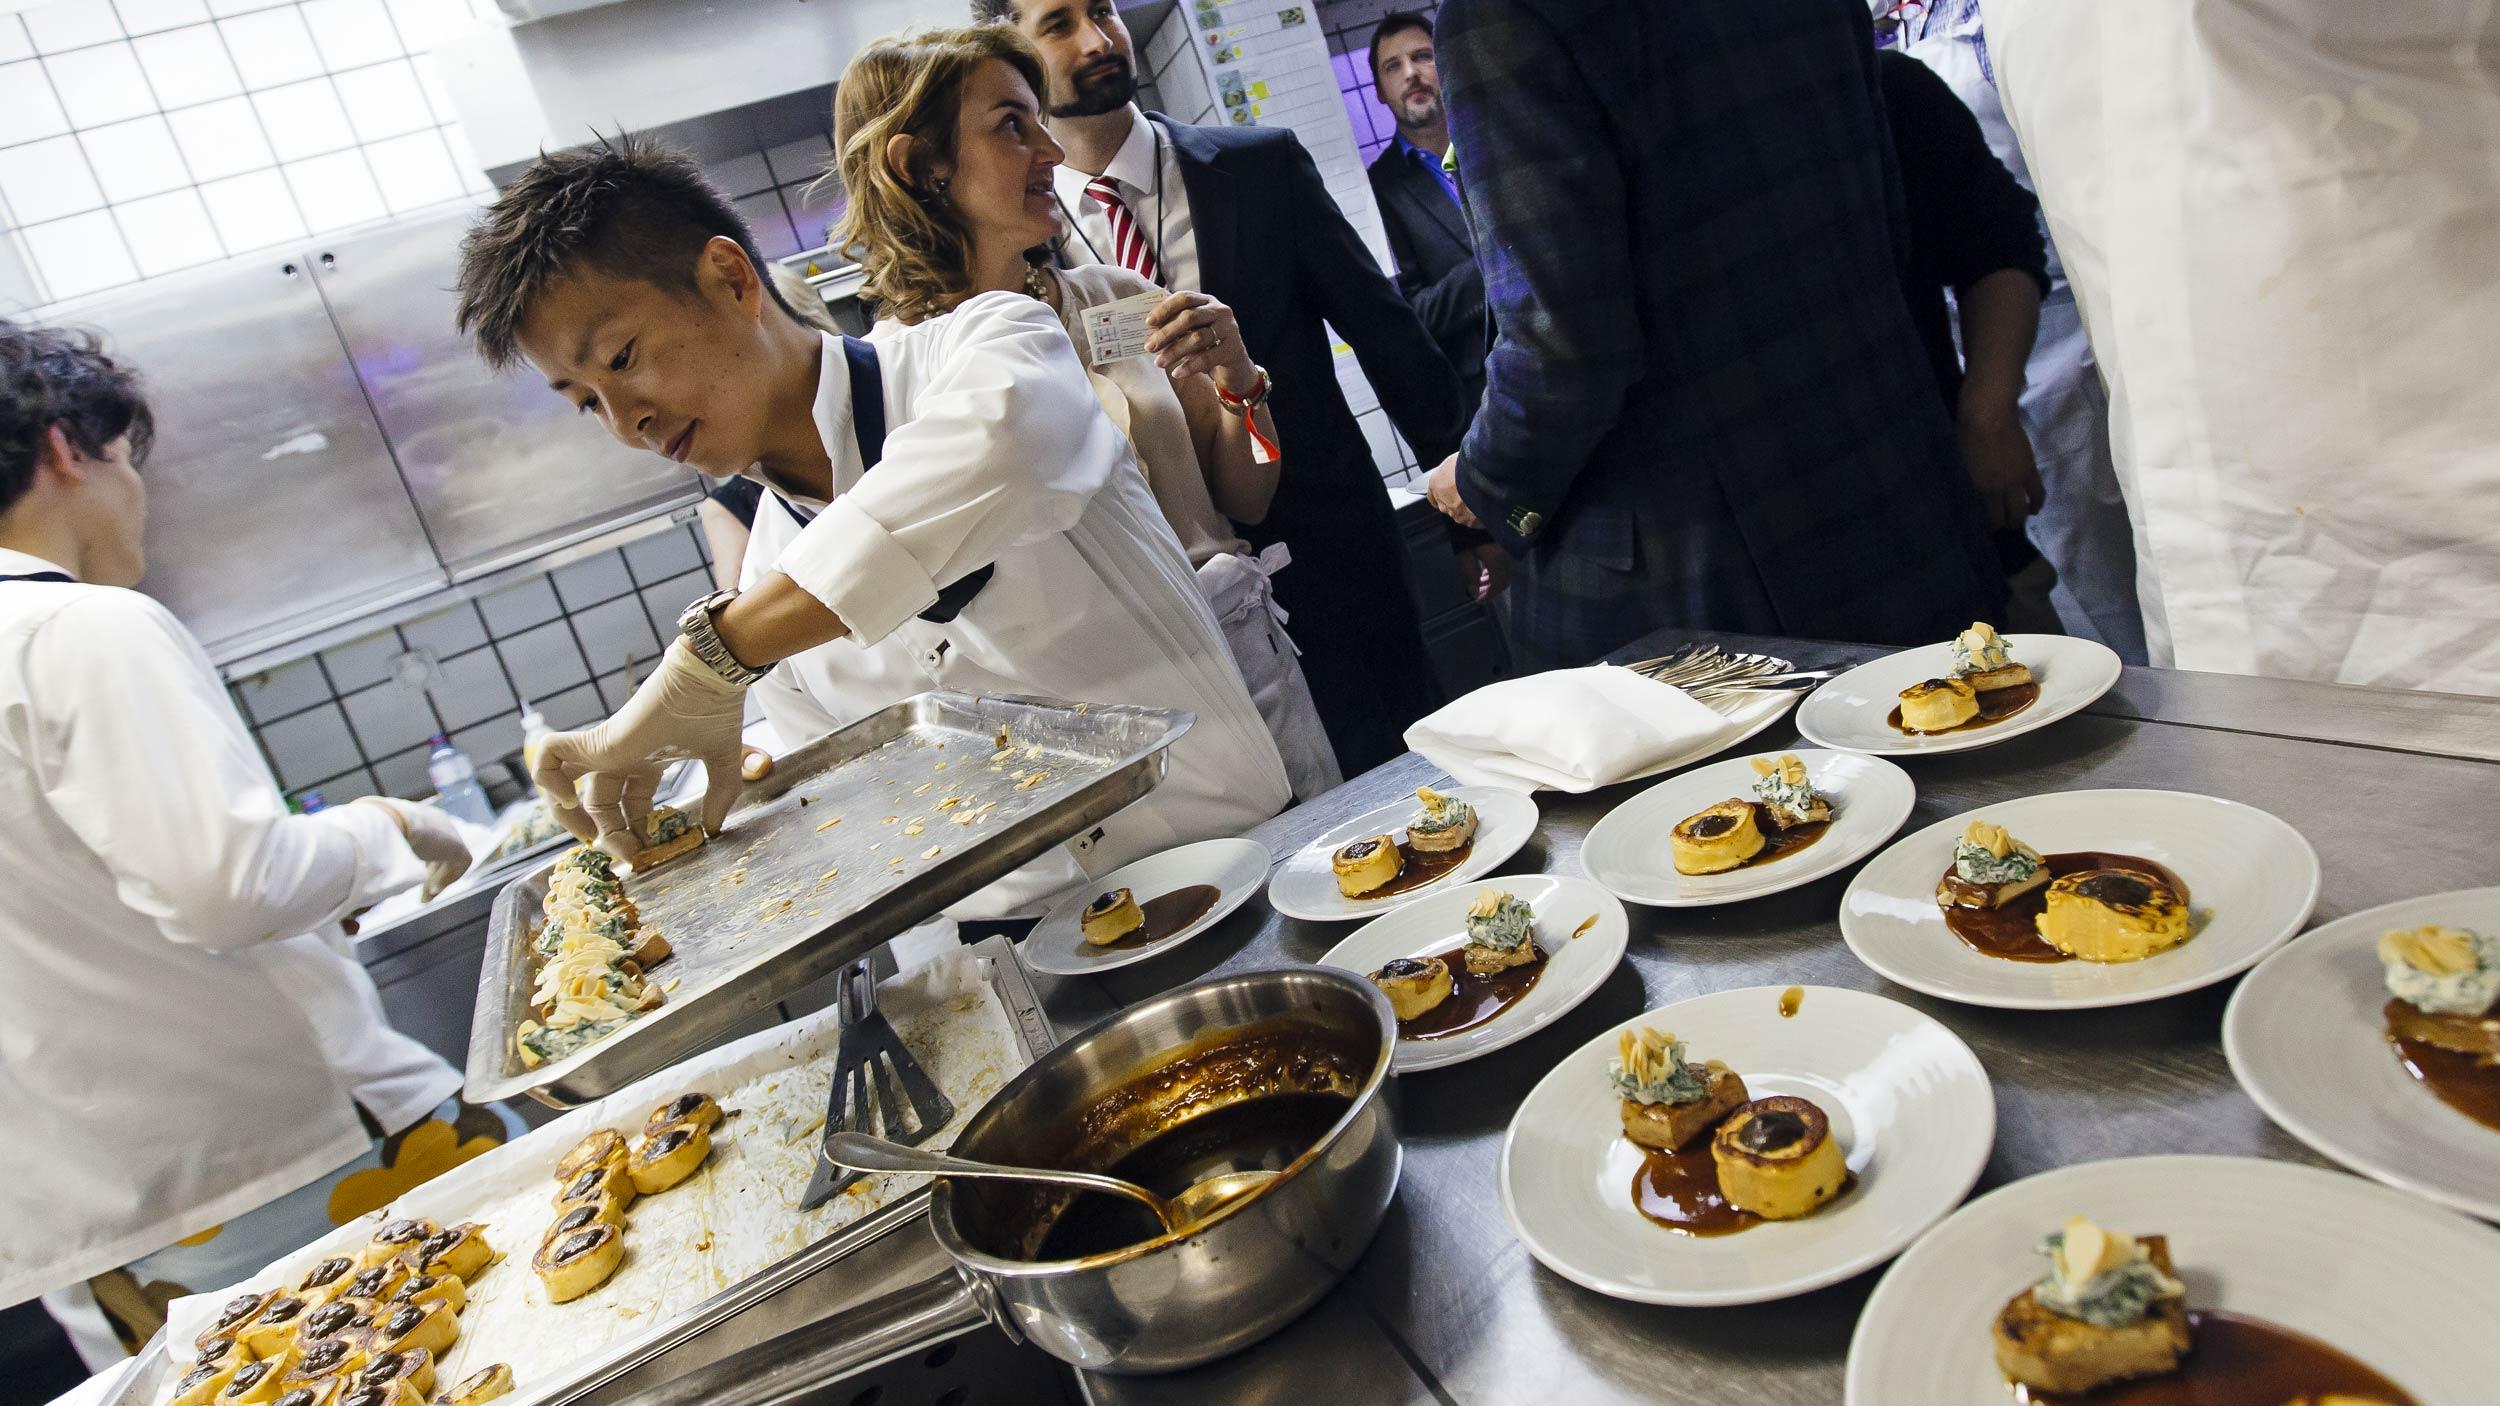 Kitchen Party 16 01 2018 22 00 St Moritz Gourmet Festival